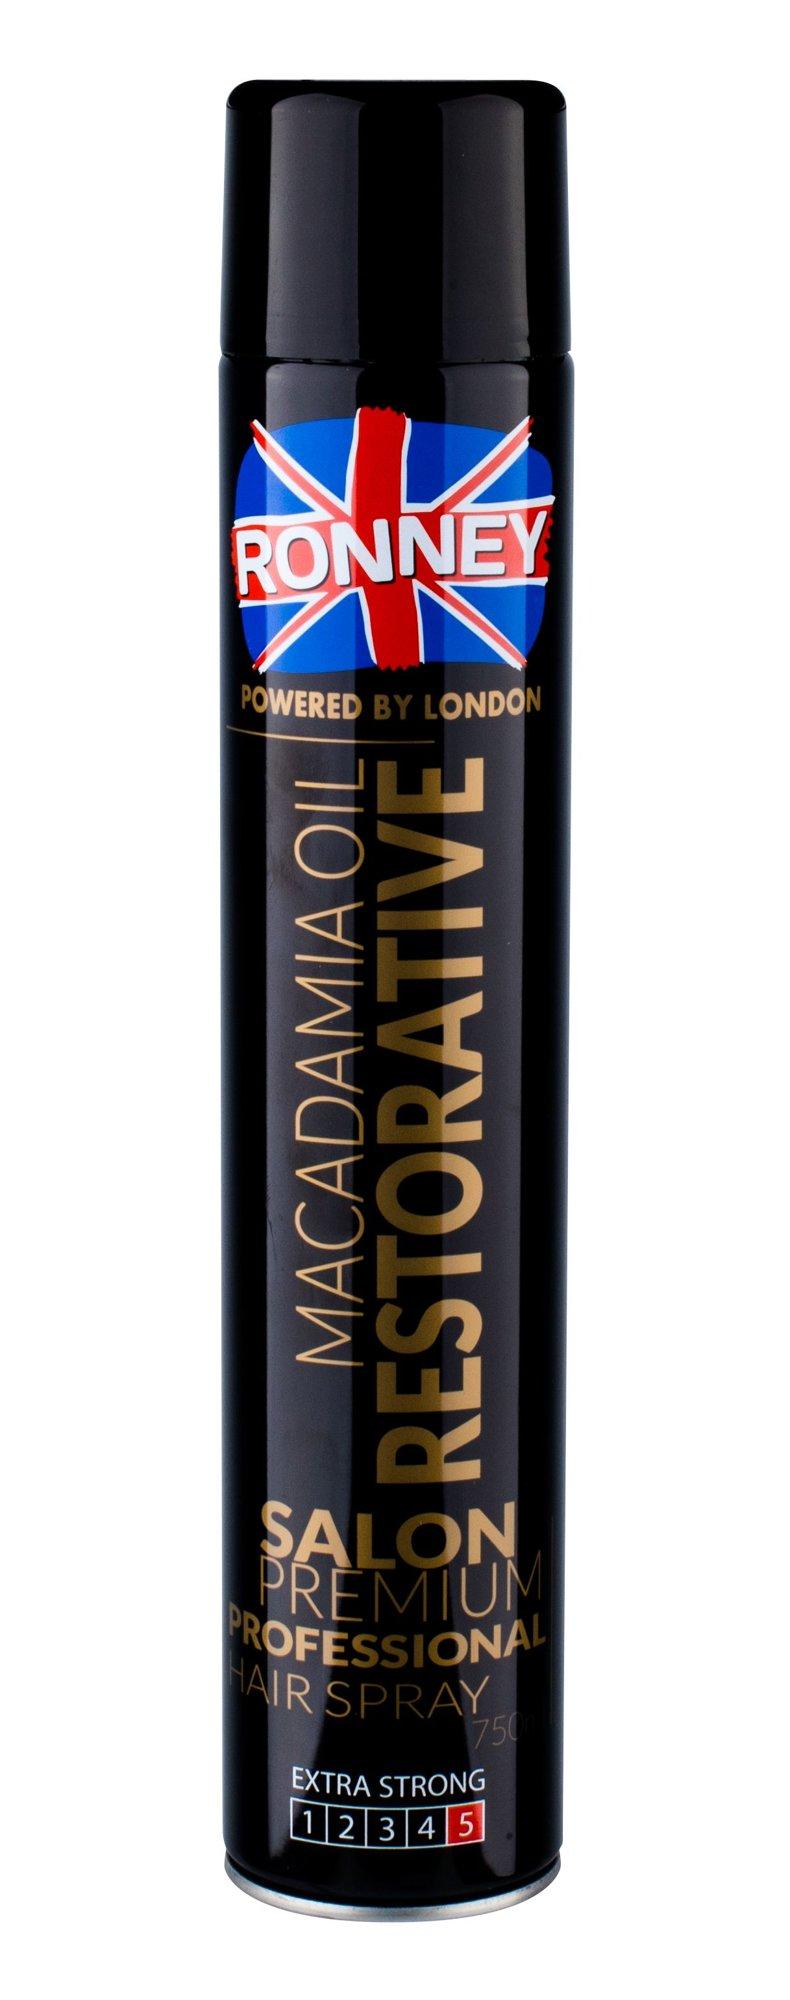 Ronney Salon Premium Professional Hair Spray 750ml  Macadamia Oil